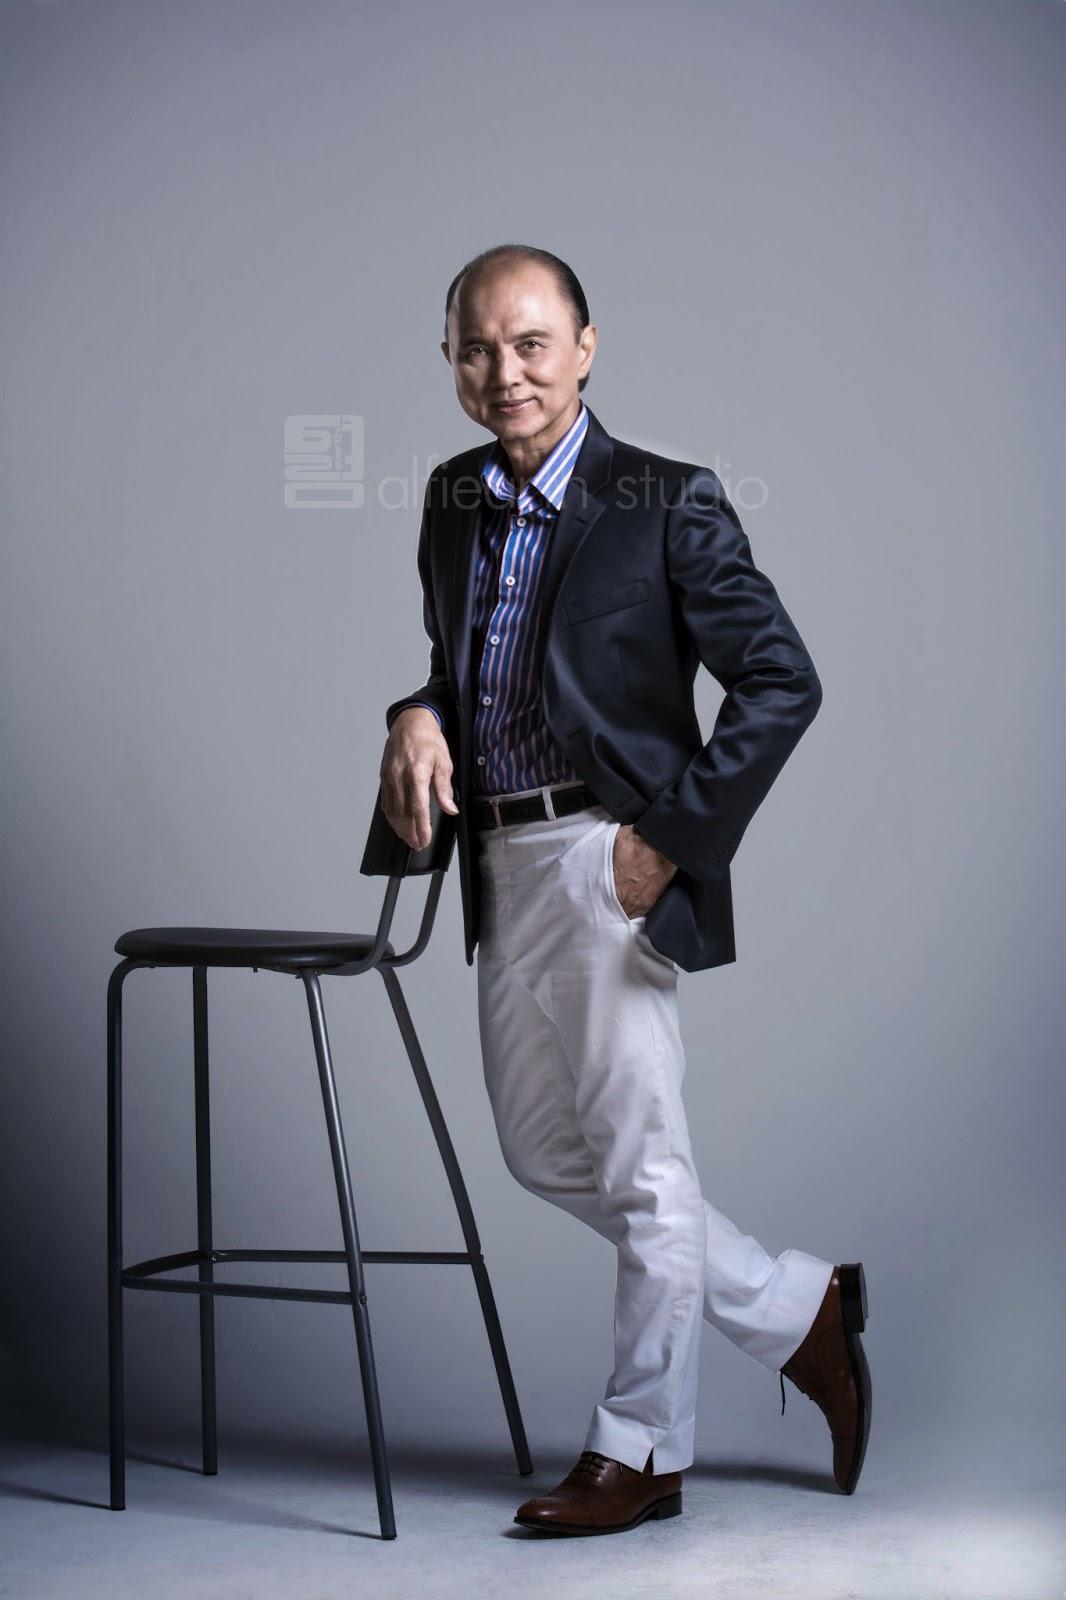 32efd87f656 Alfiearth fashion  Prof. Datuk Dr. Jimmy Choo OBE potrait